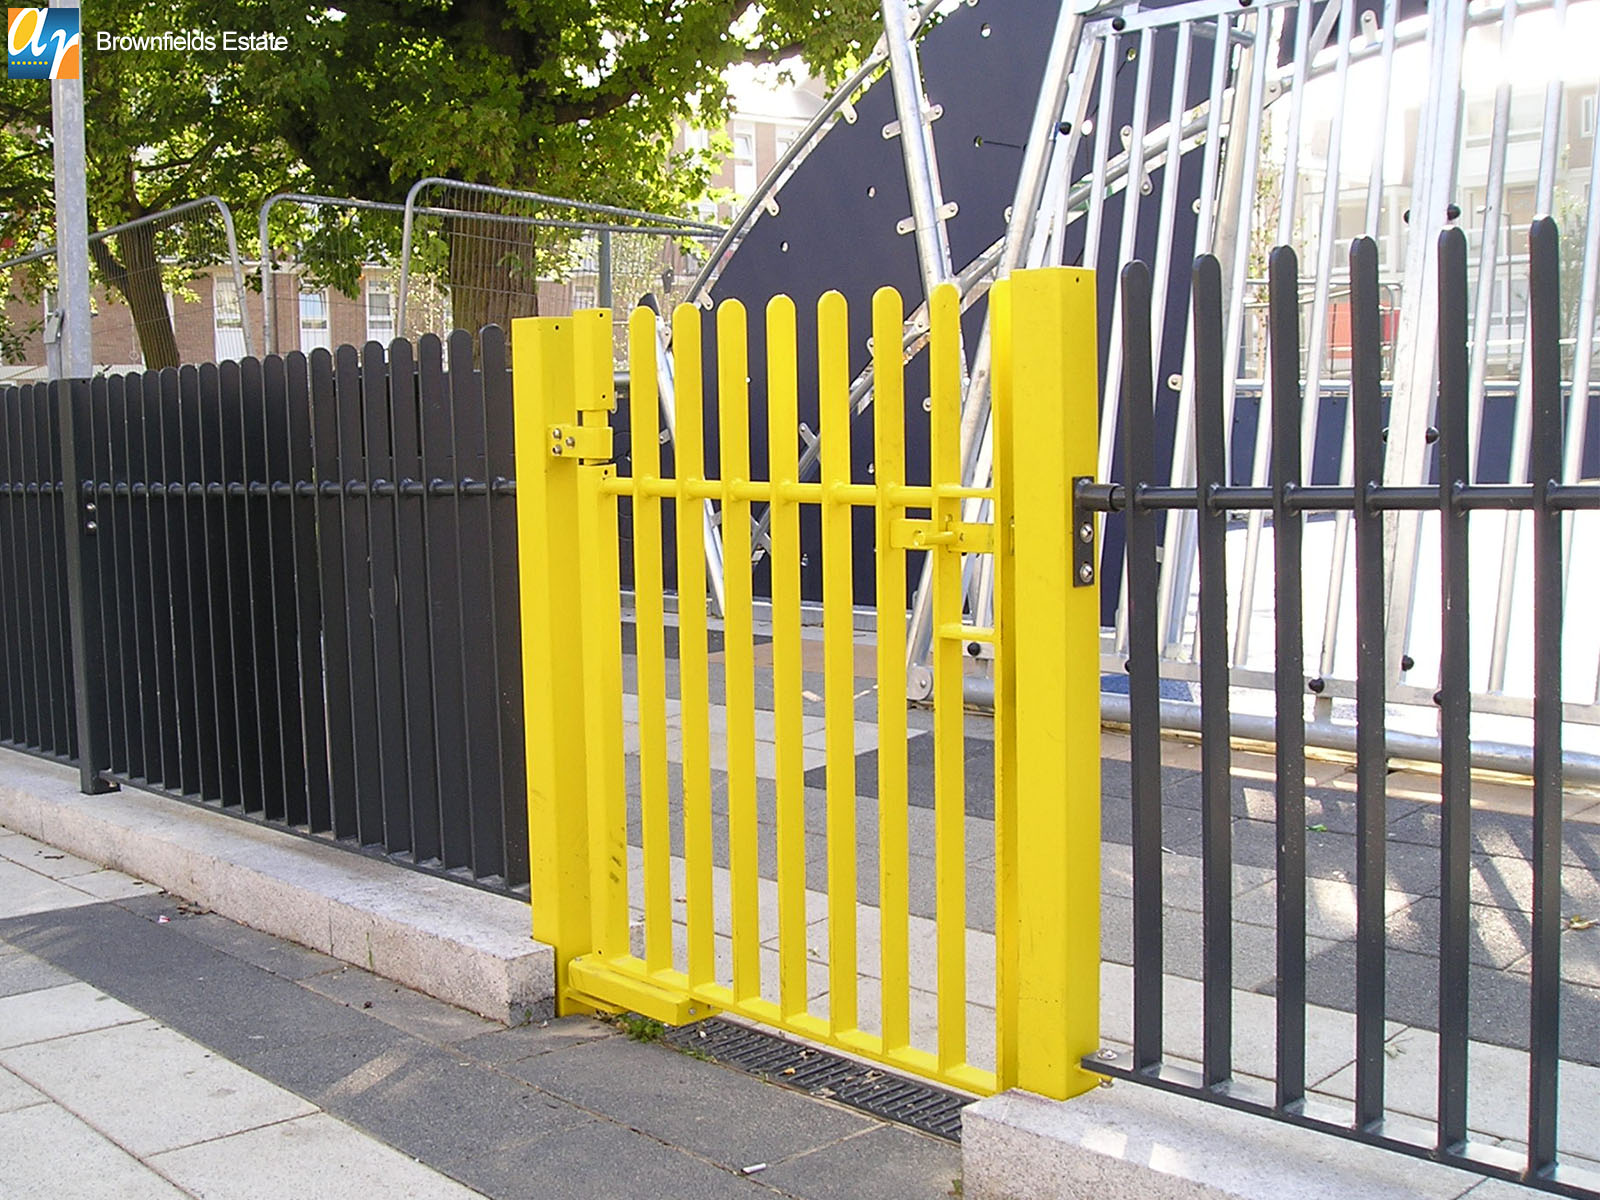 Brownfields estate metal gates